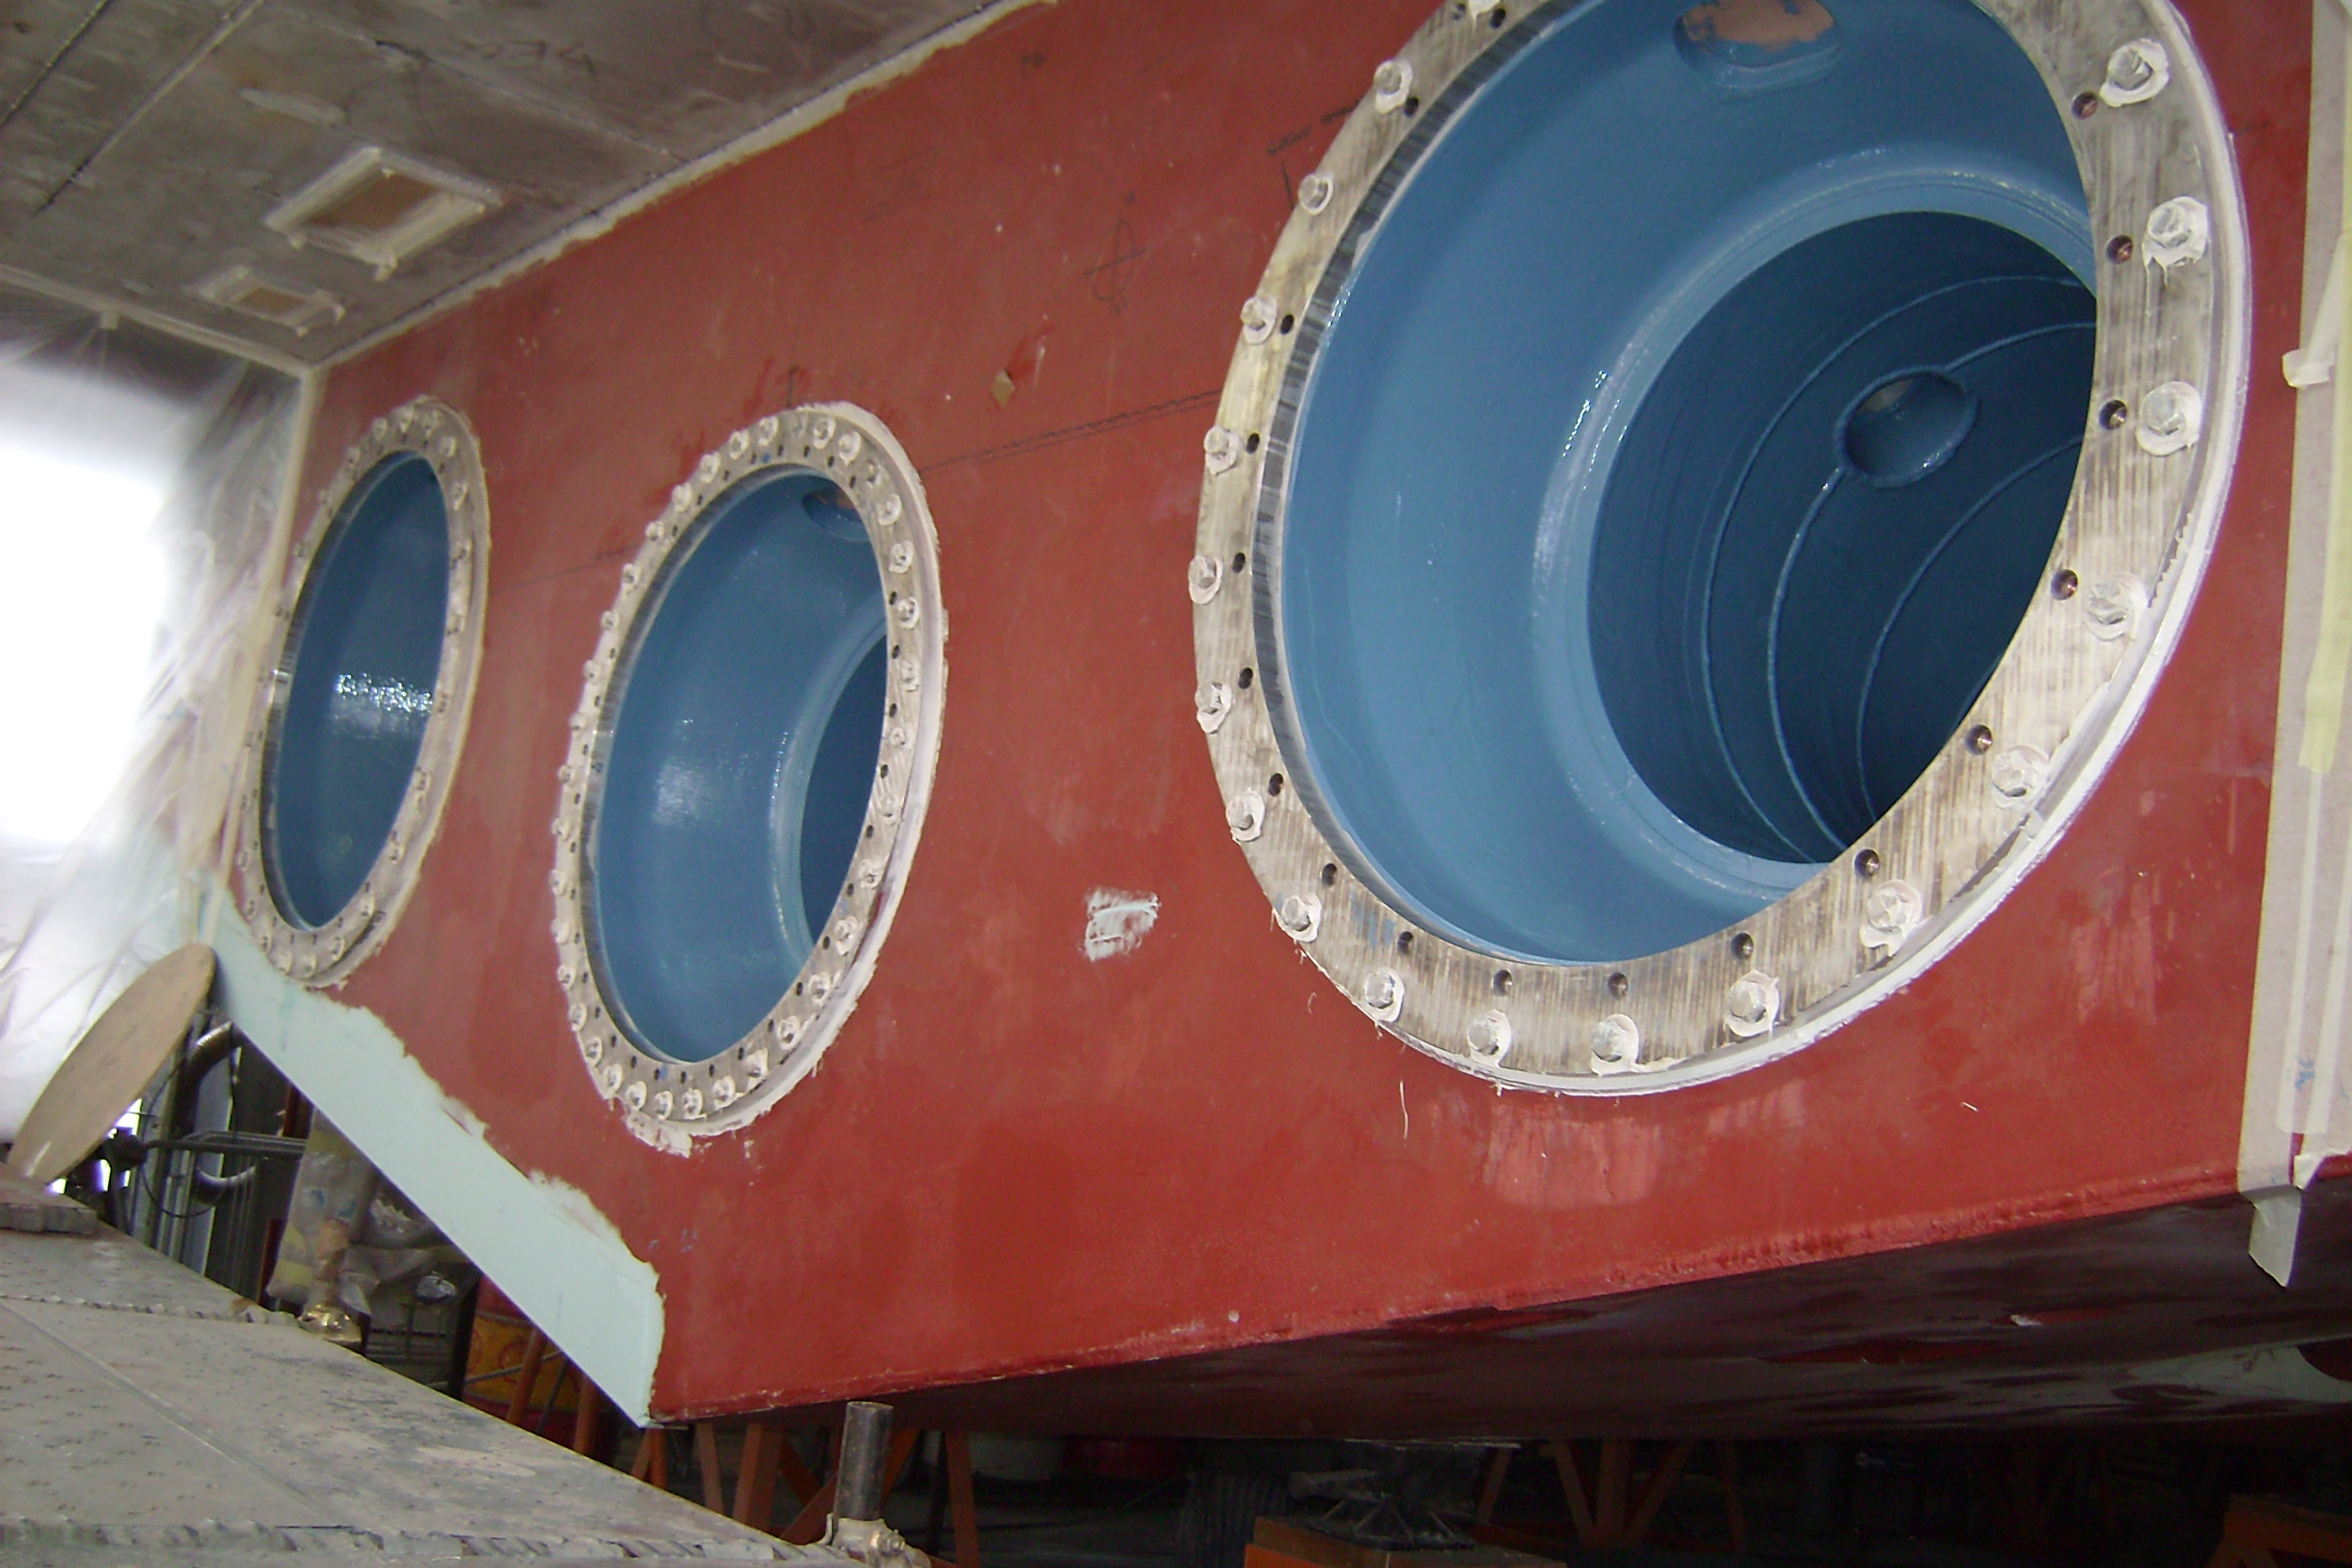 5. Rivestimento scoop idrogetti yacht